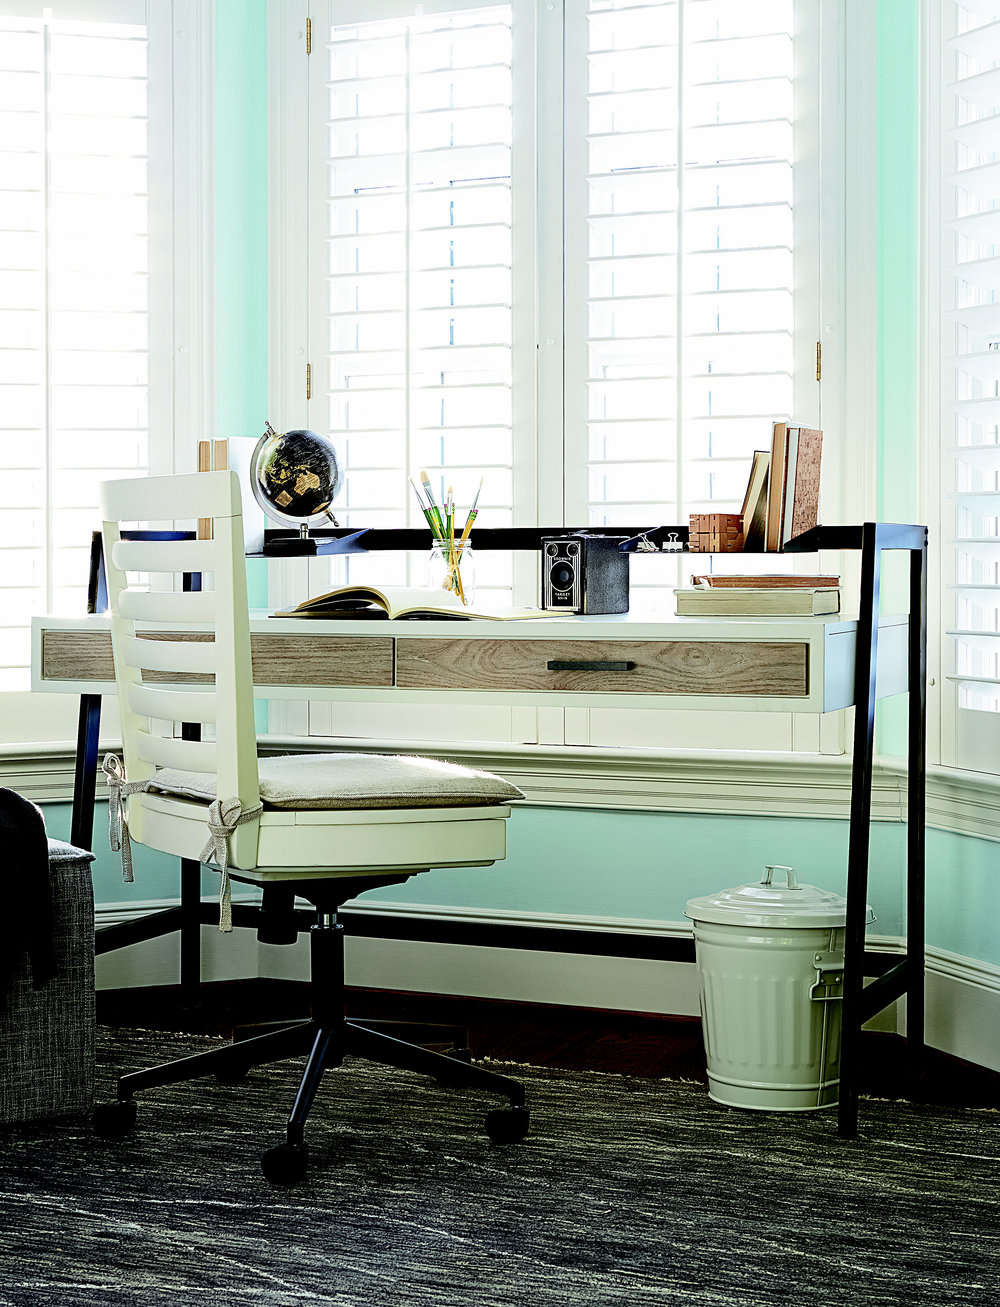 UNIV_MyRoom_Desk.jpg